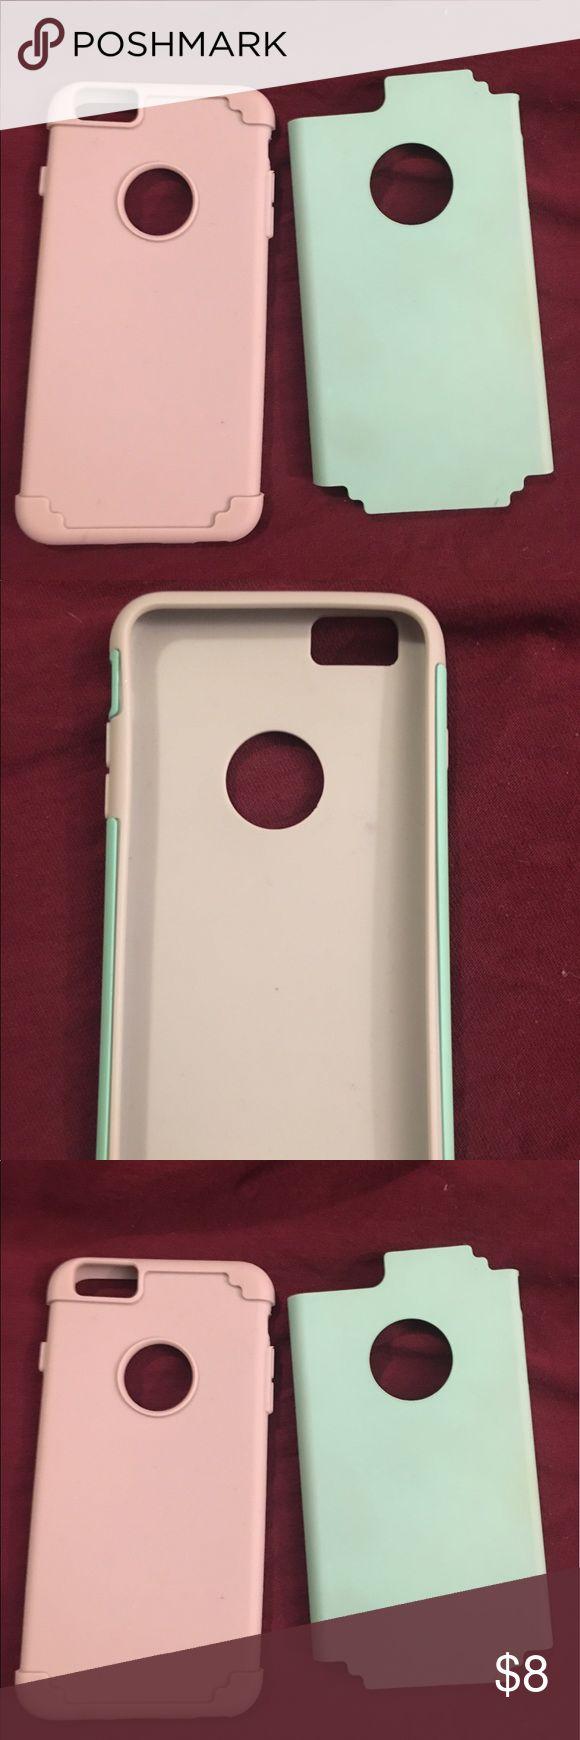 Sea foam green iPhone six plus case! iPhone six plus case. Gray rubber like case with detachable sea foam green back. Other